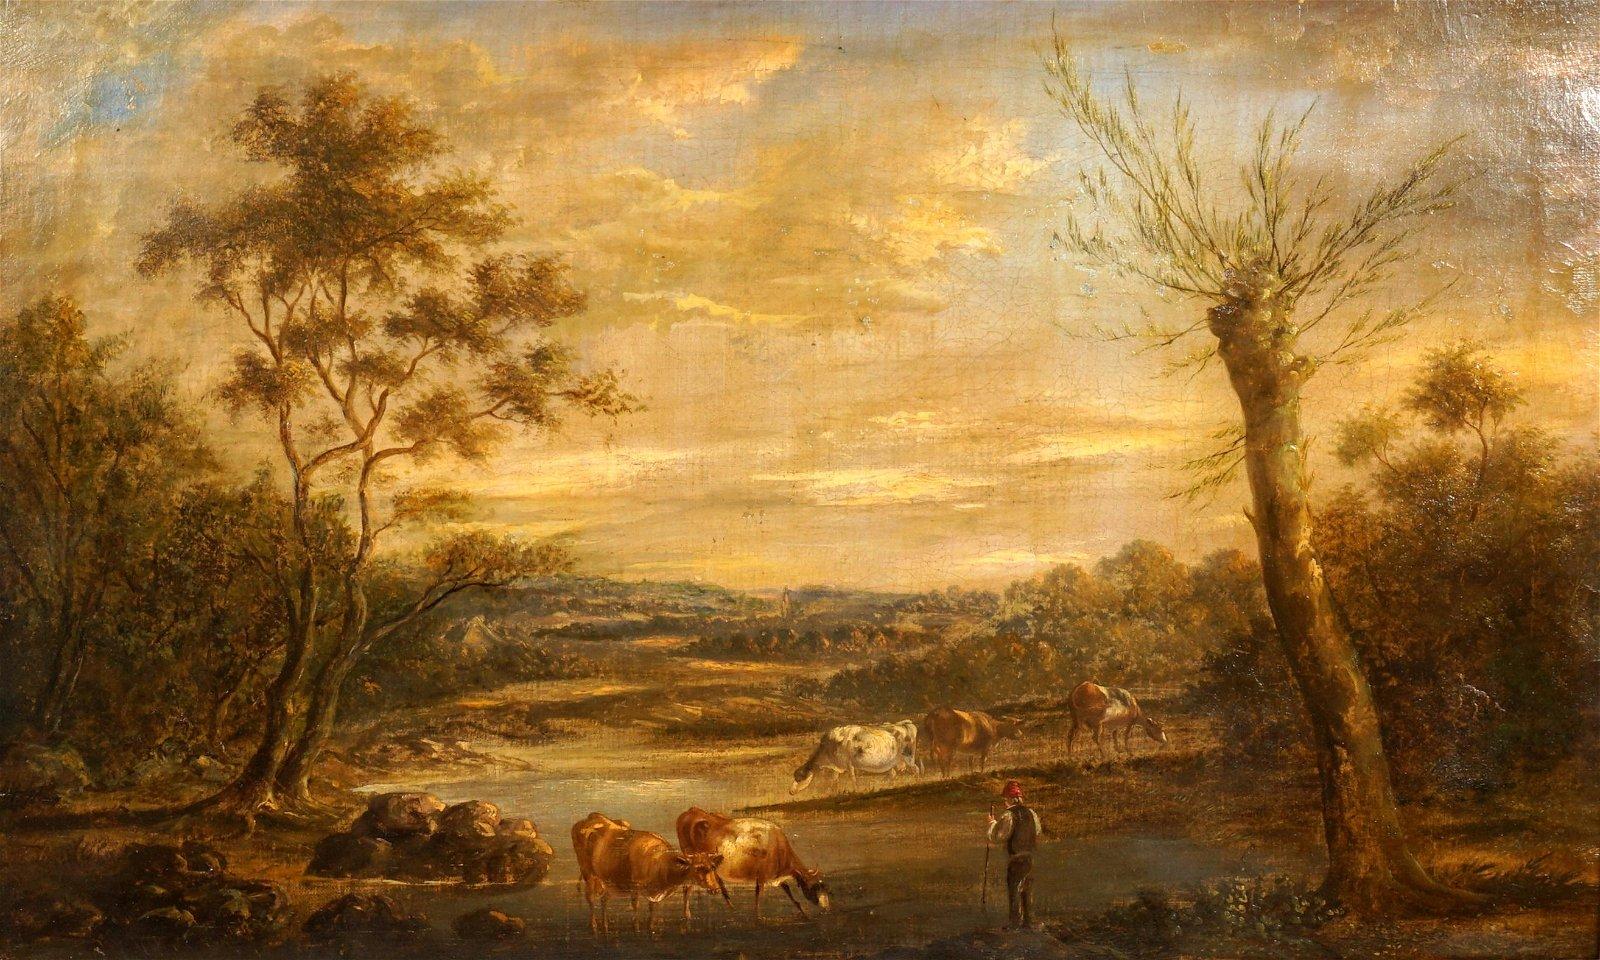 Thomas Creswick Landscape with Fisherman